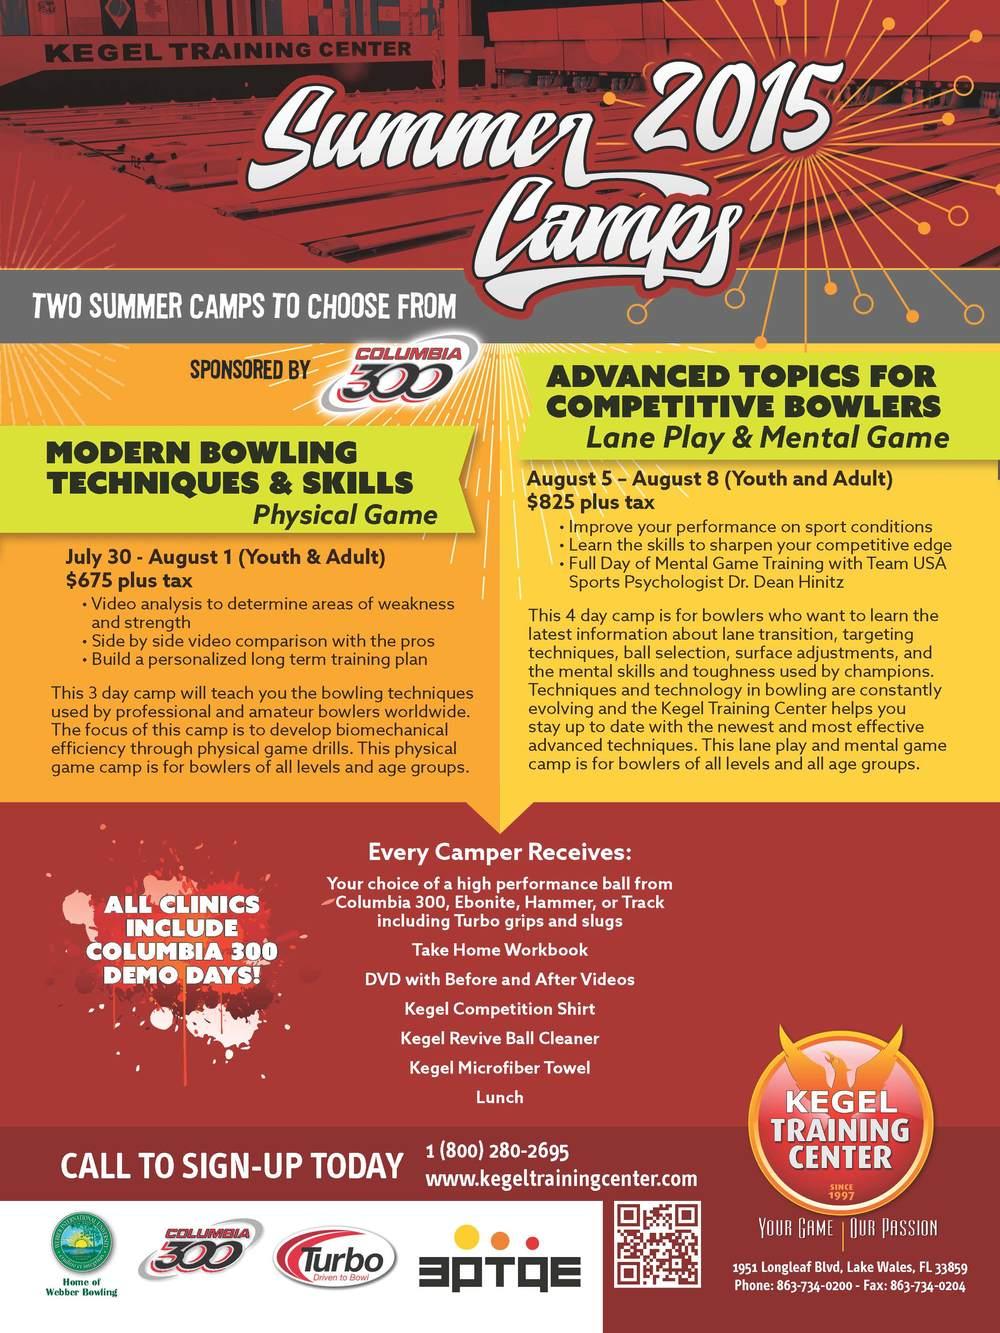 KTC-SummerCamp2015.jpg